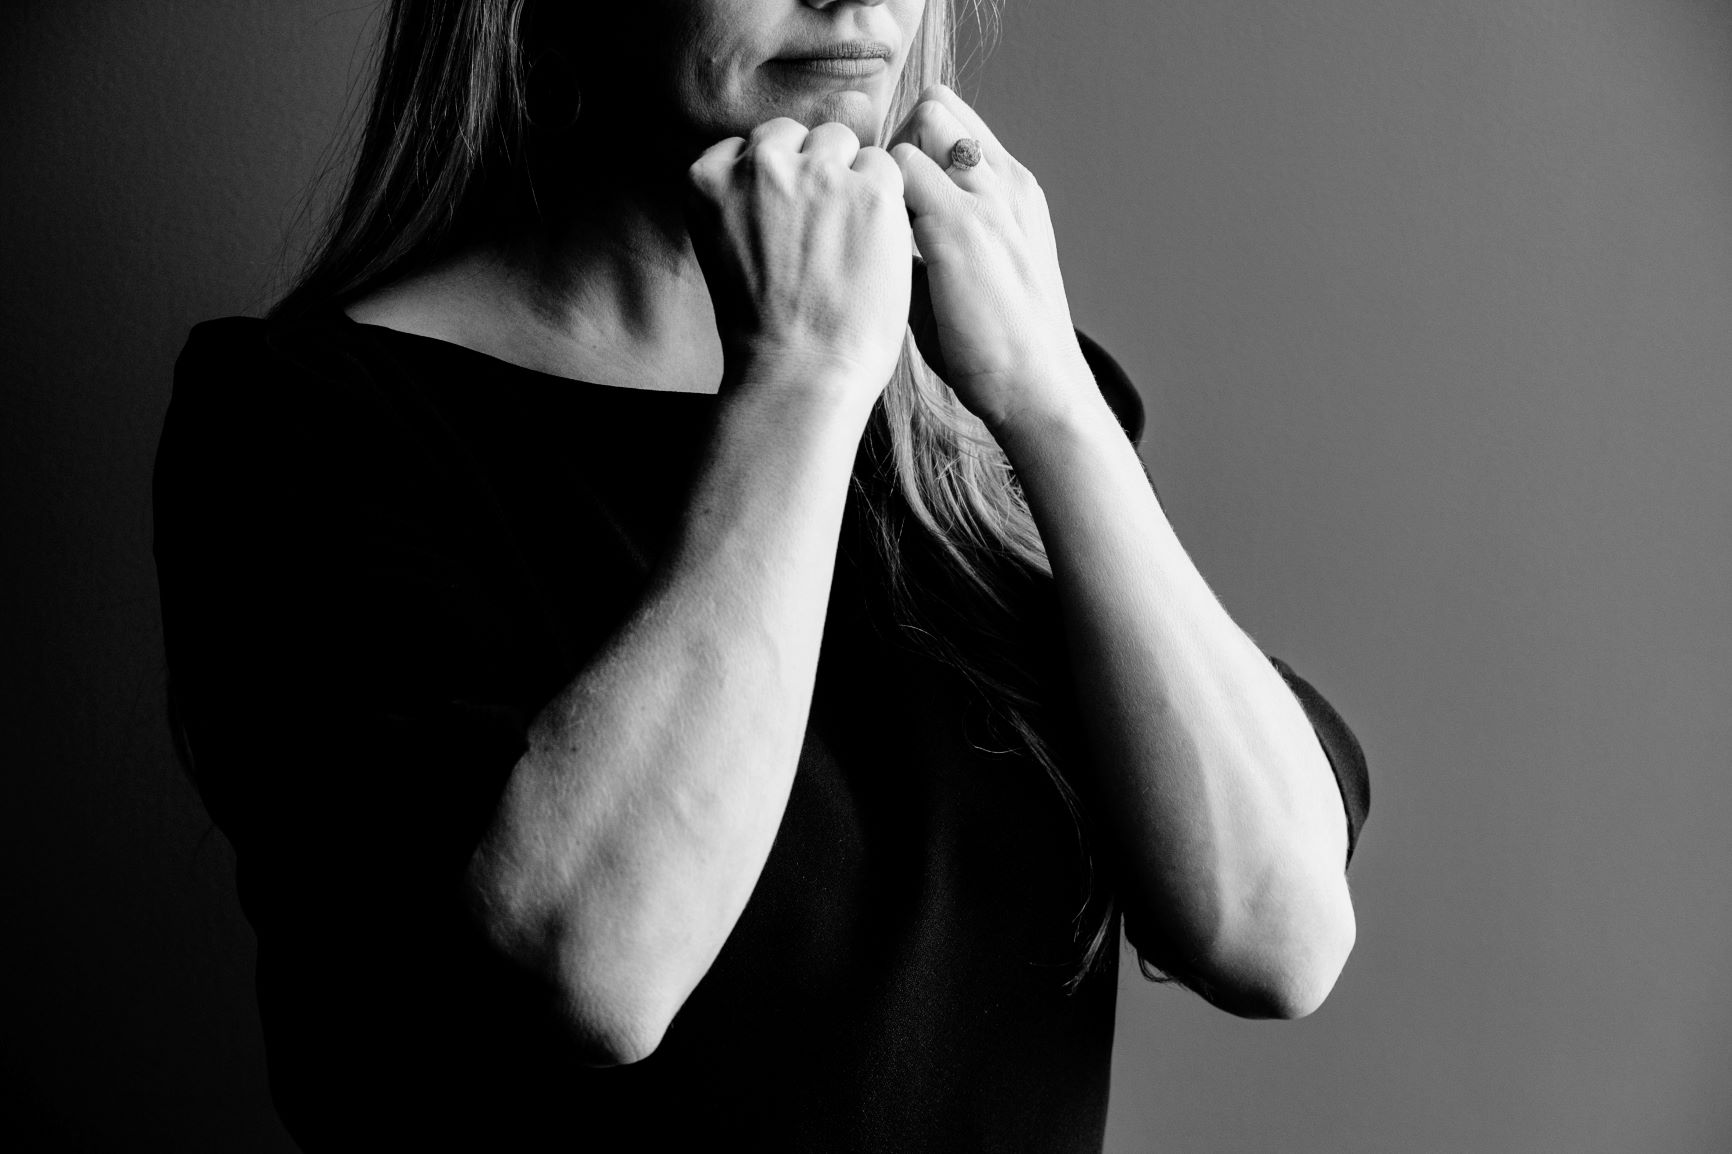 Woman Interpreting with Sign Language